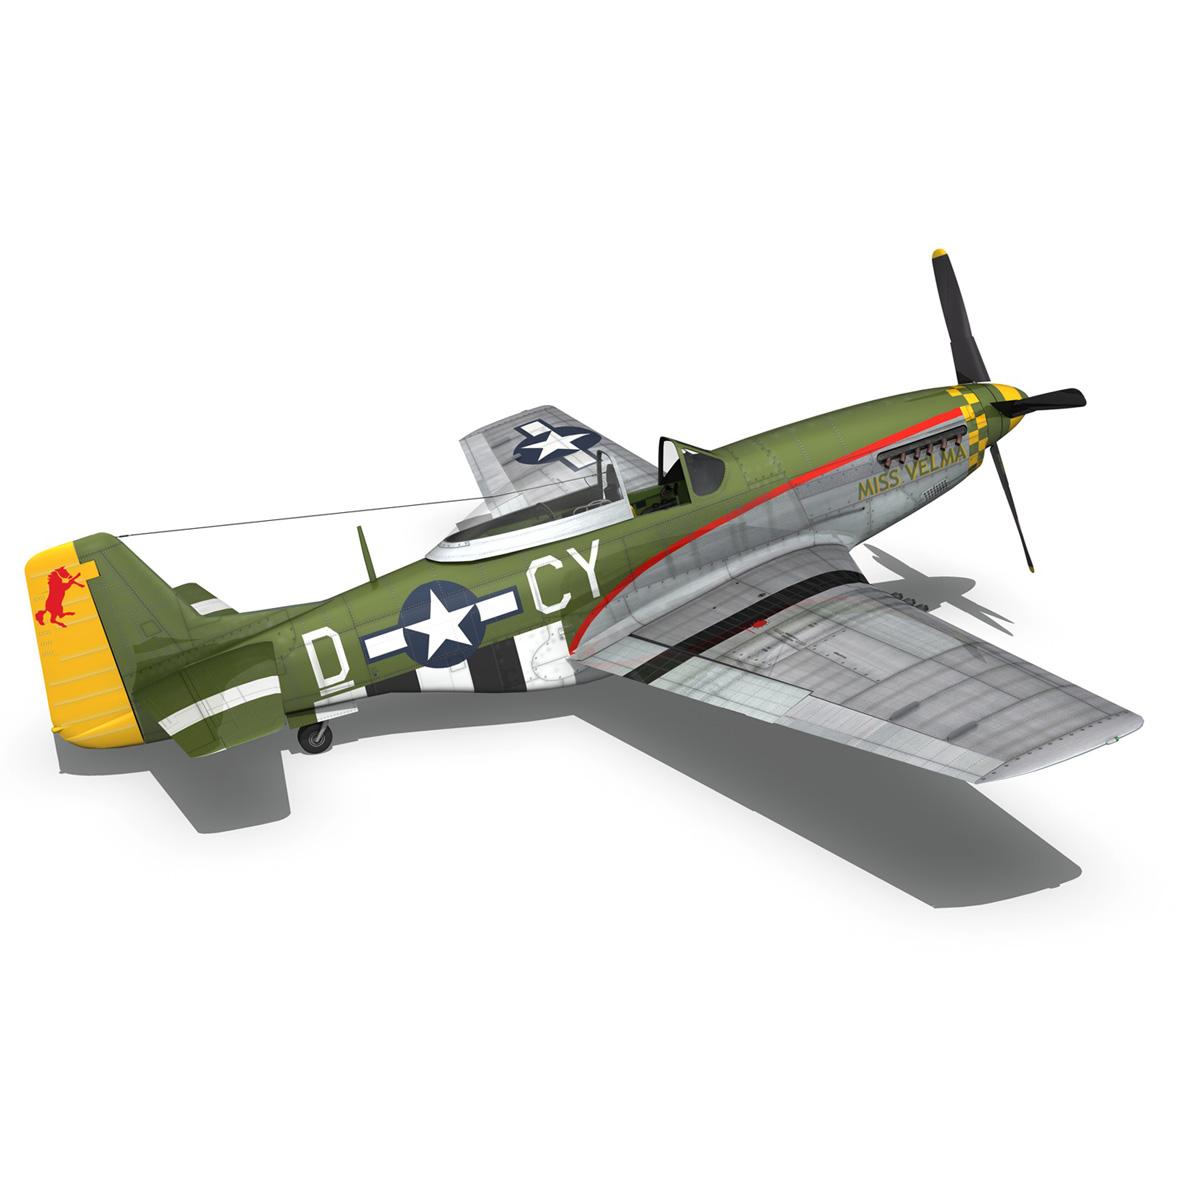 north american p-51d – mustang – miss velma 3d model 3ds fbx c4d lwo obj 267630